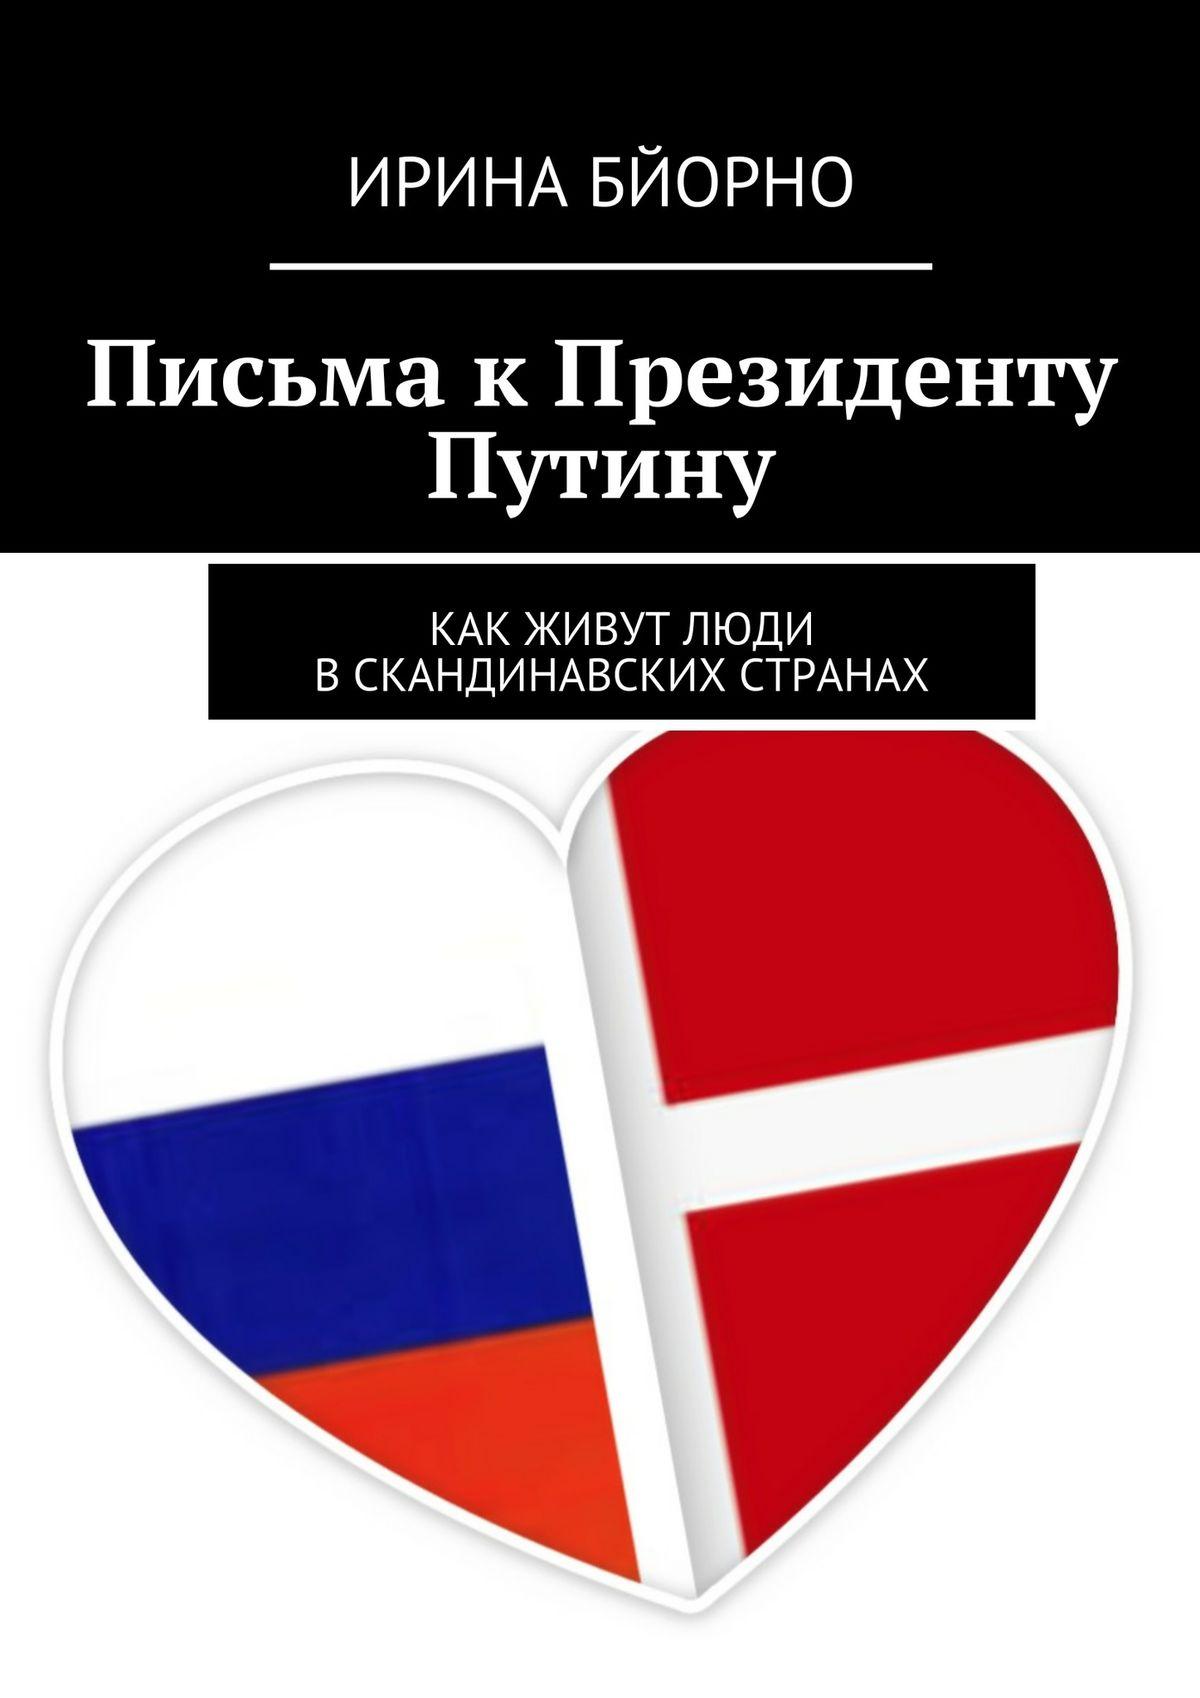 цена Ирина Бйорно Письма к Президенту Путину